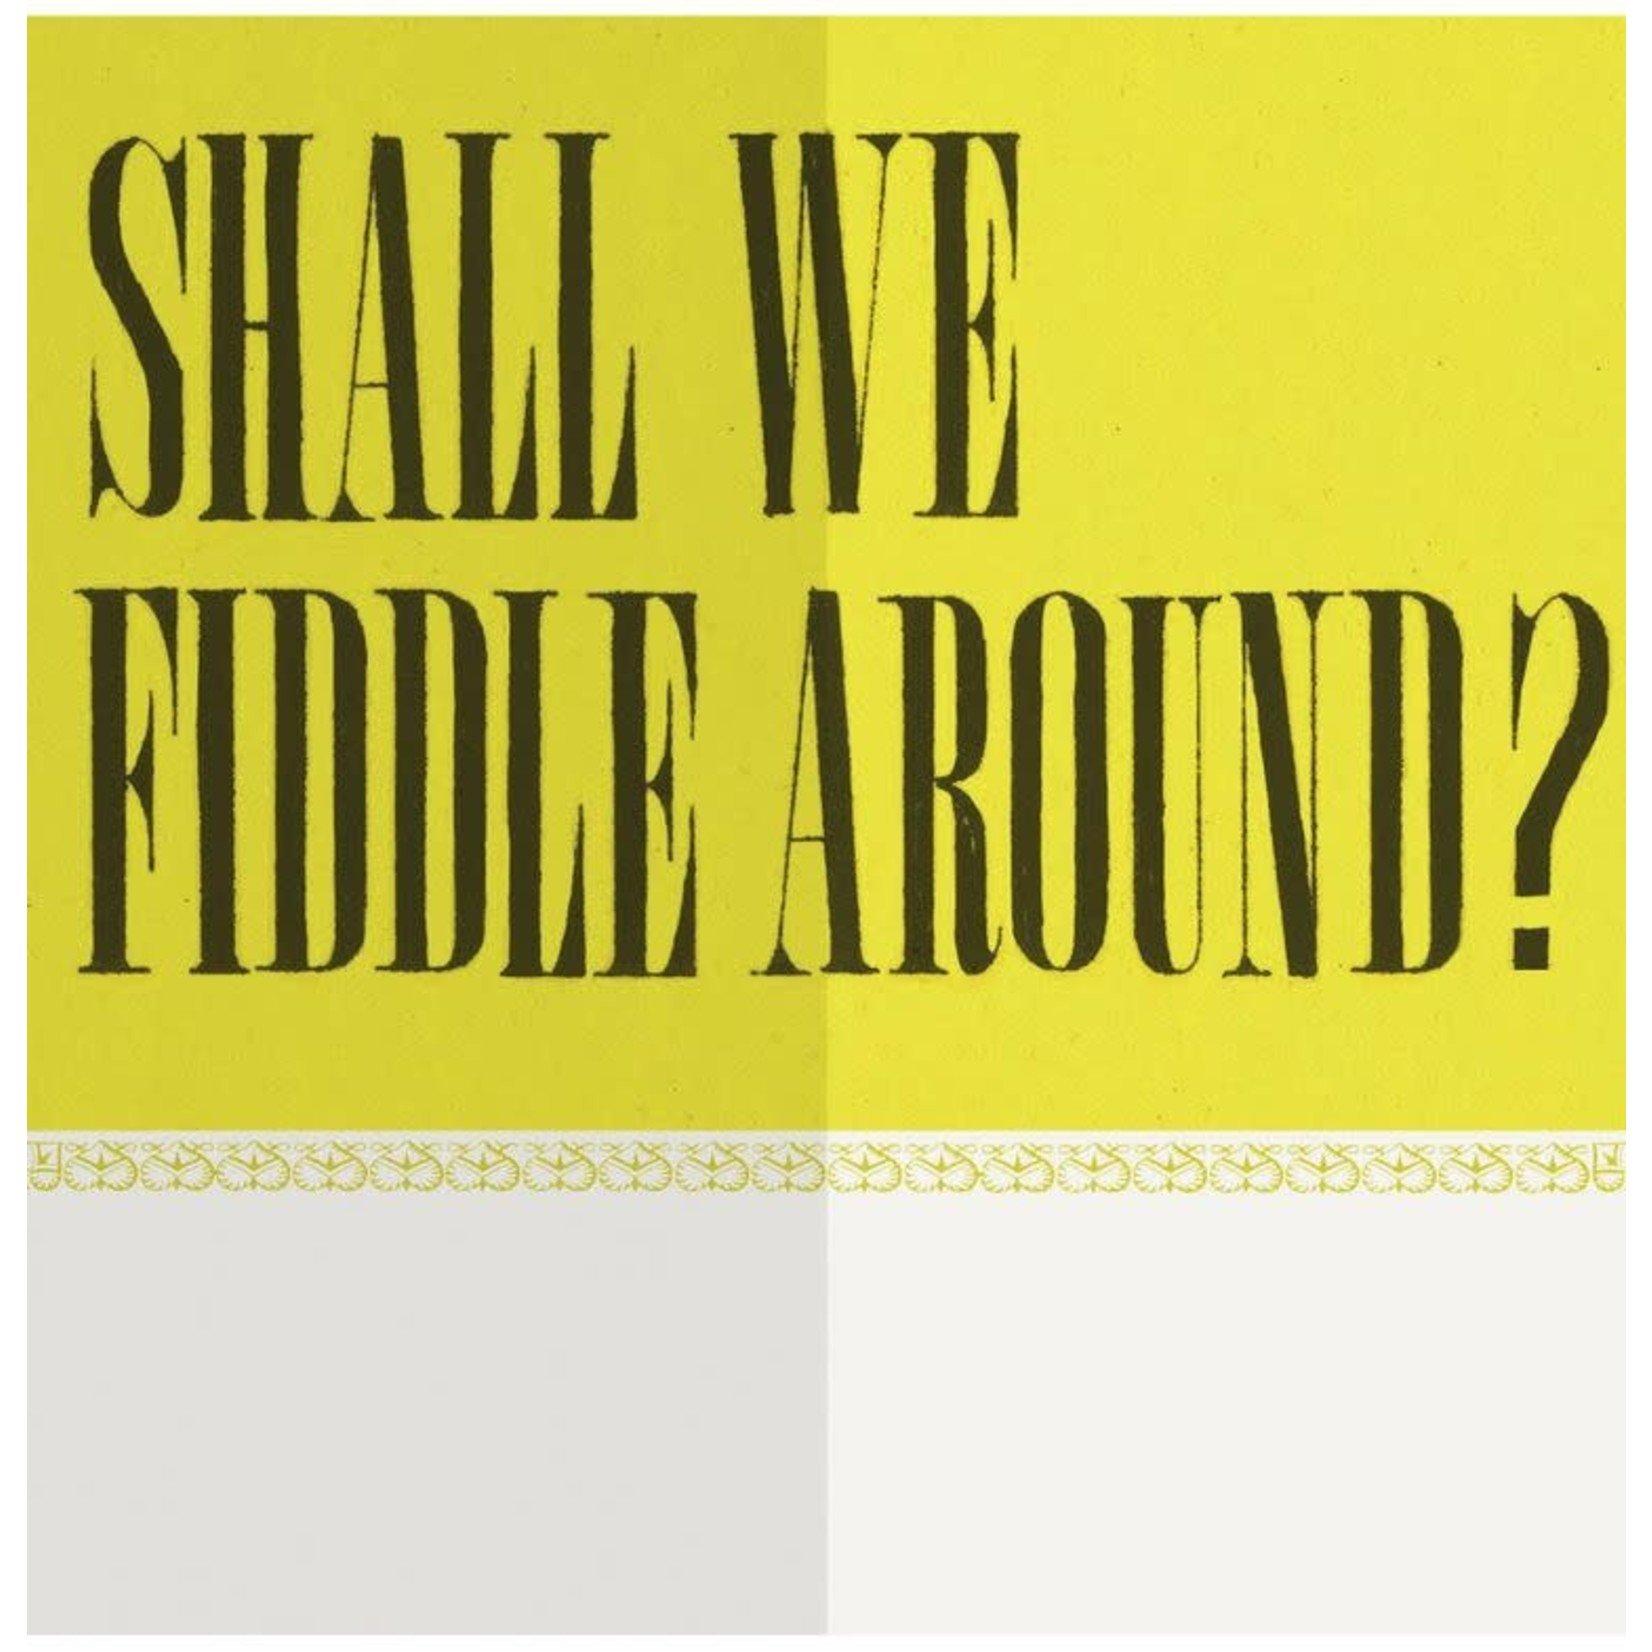 Card (Mini) - Shall We Fiddle Around